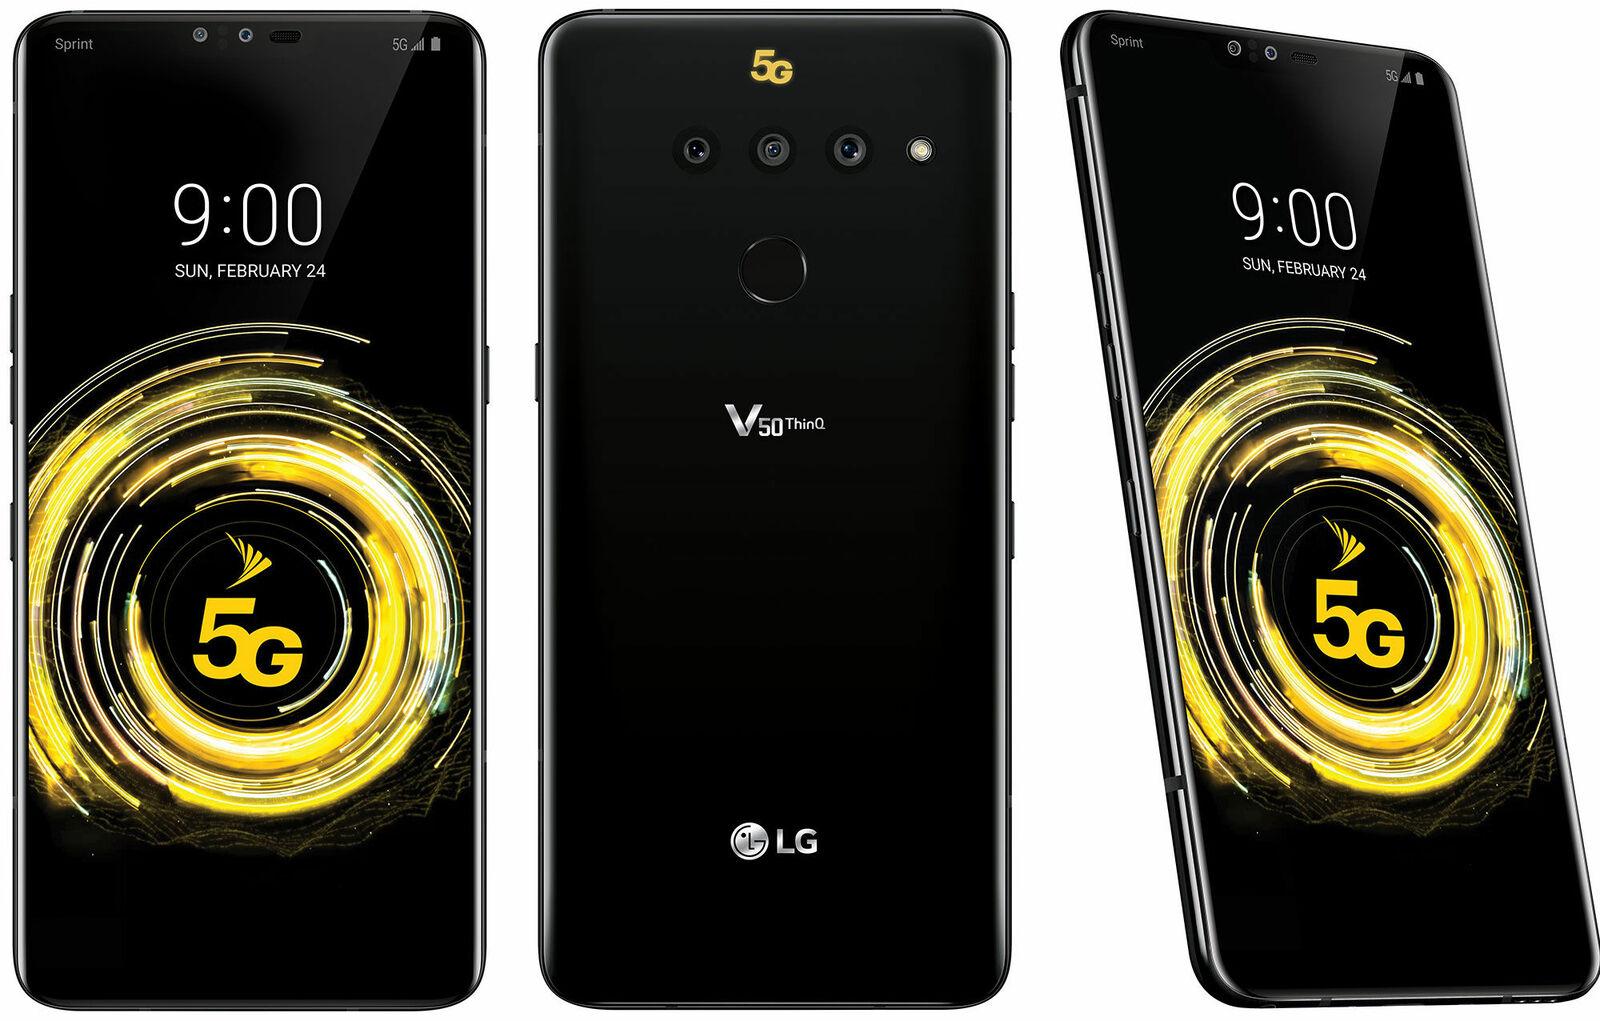 BRAND NEW LG V50 5G ThinnQ 5G SPRINT & GSM UNLOCKED- T-MOBILE AT&T METRO CRICKET